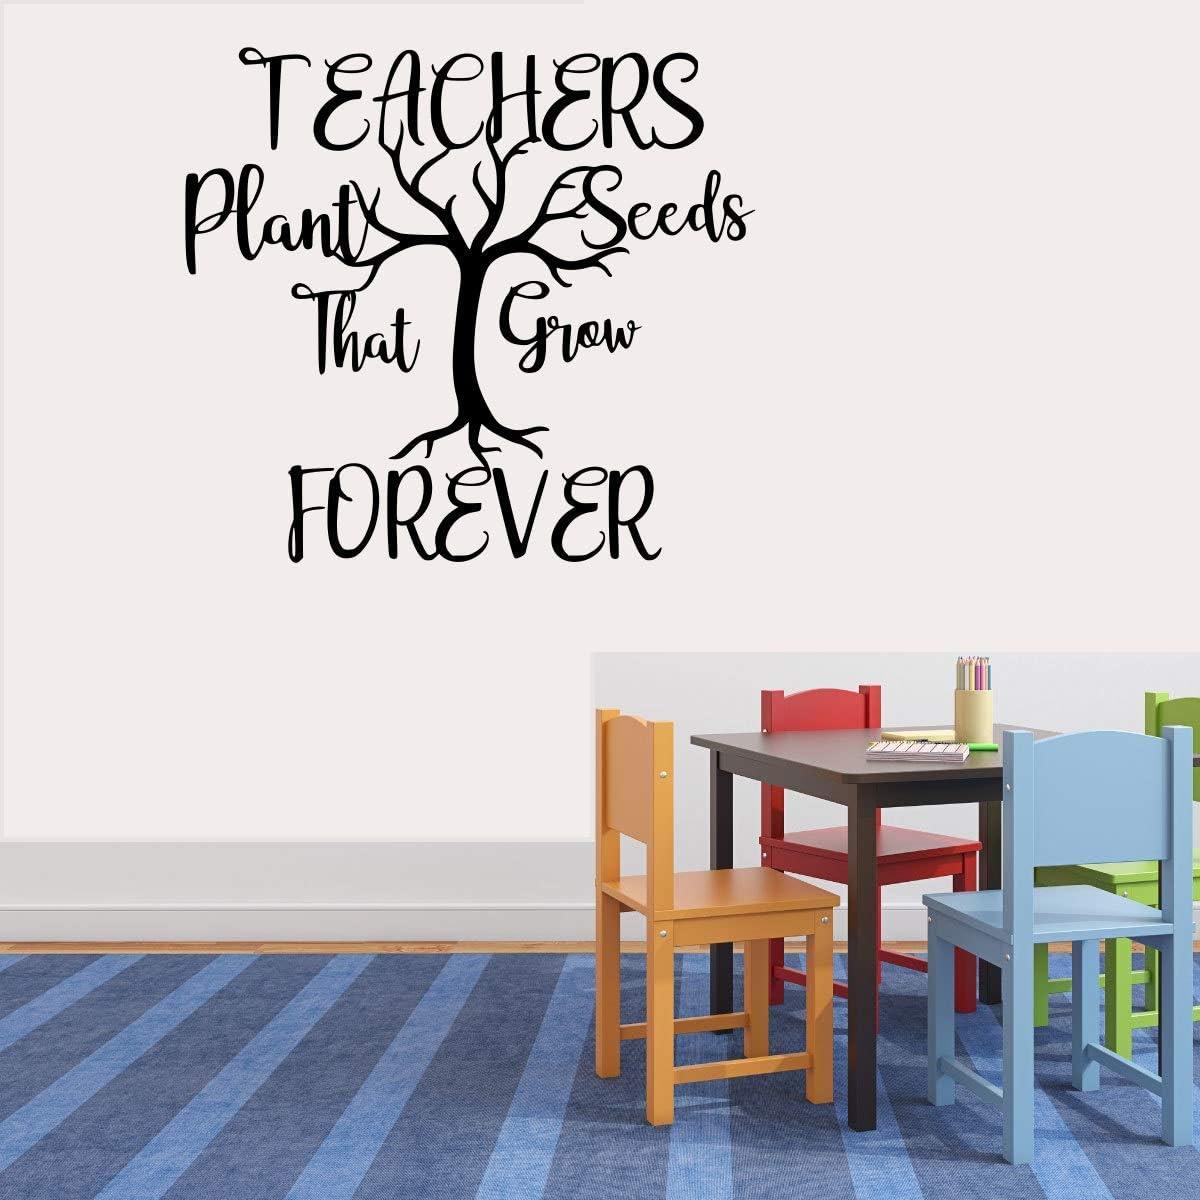 Teachers Plant Seeds That Last Forever (B) Vinyl Decal Wall Sticker, Teacher Quote, DIY, Wall Decal, Art, Mural, Classroom Decor, 13